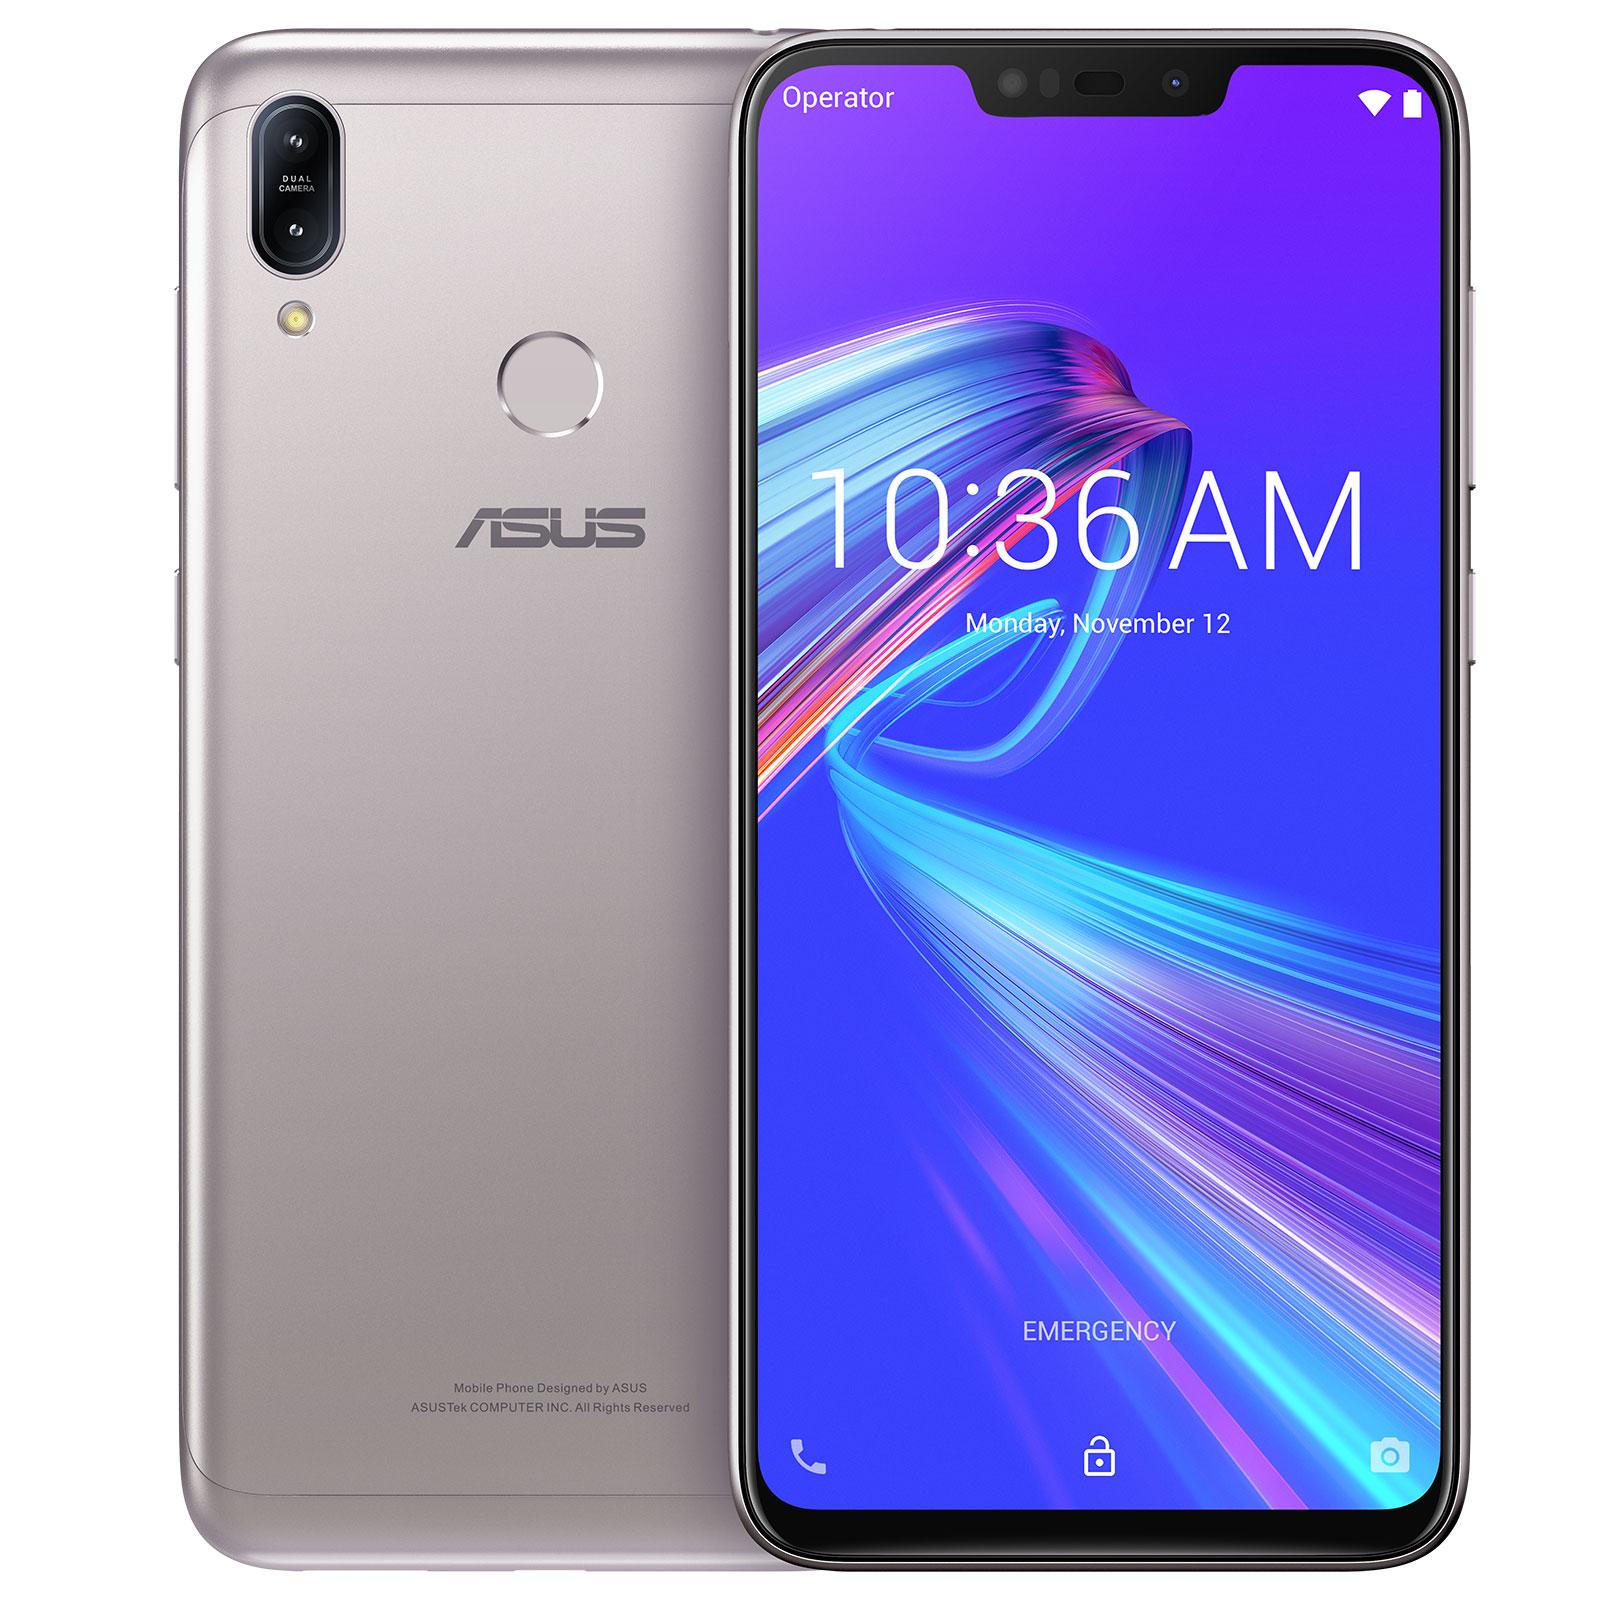 ASUS ZenFone Max M2 Argent 4 Go 32 Smartphone 4G LTE Dual SIM